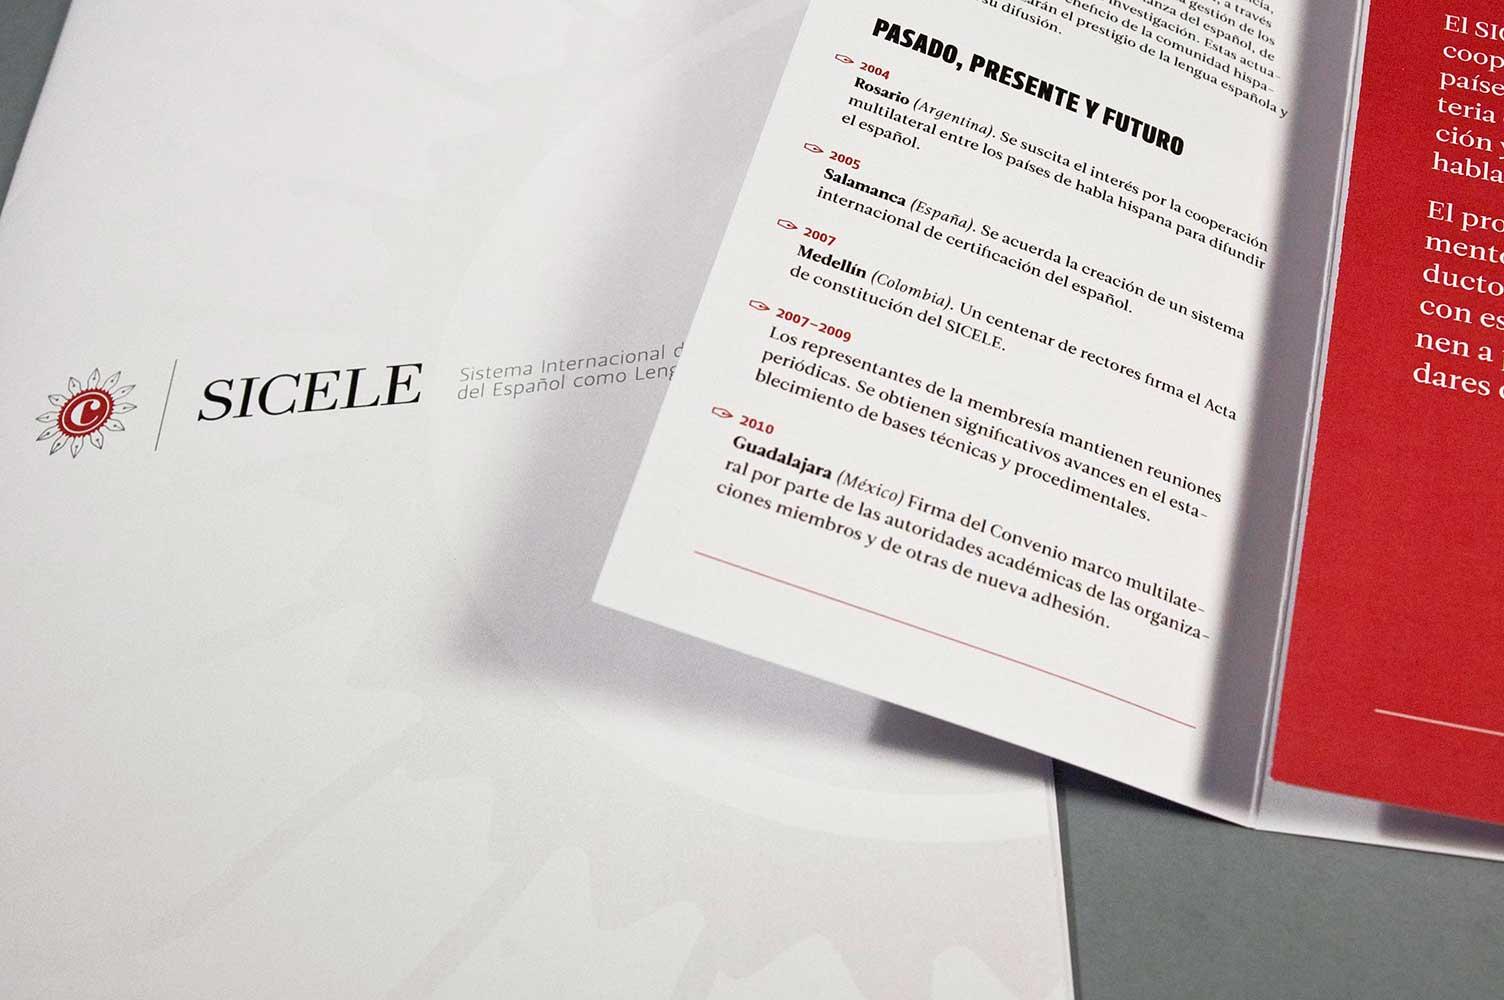 Manual de identidad SICELE